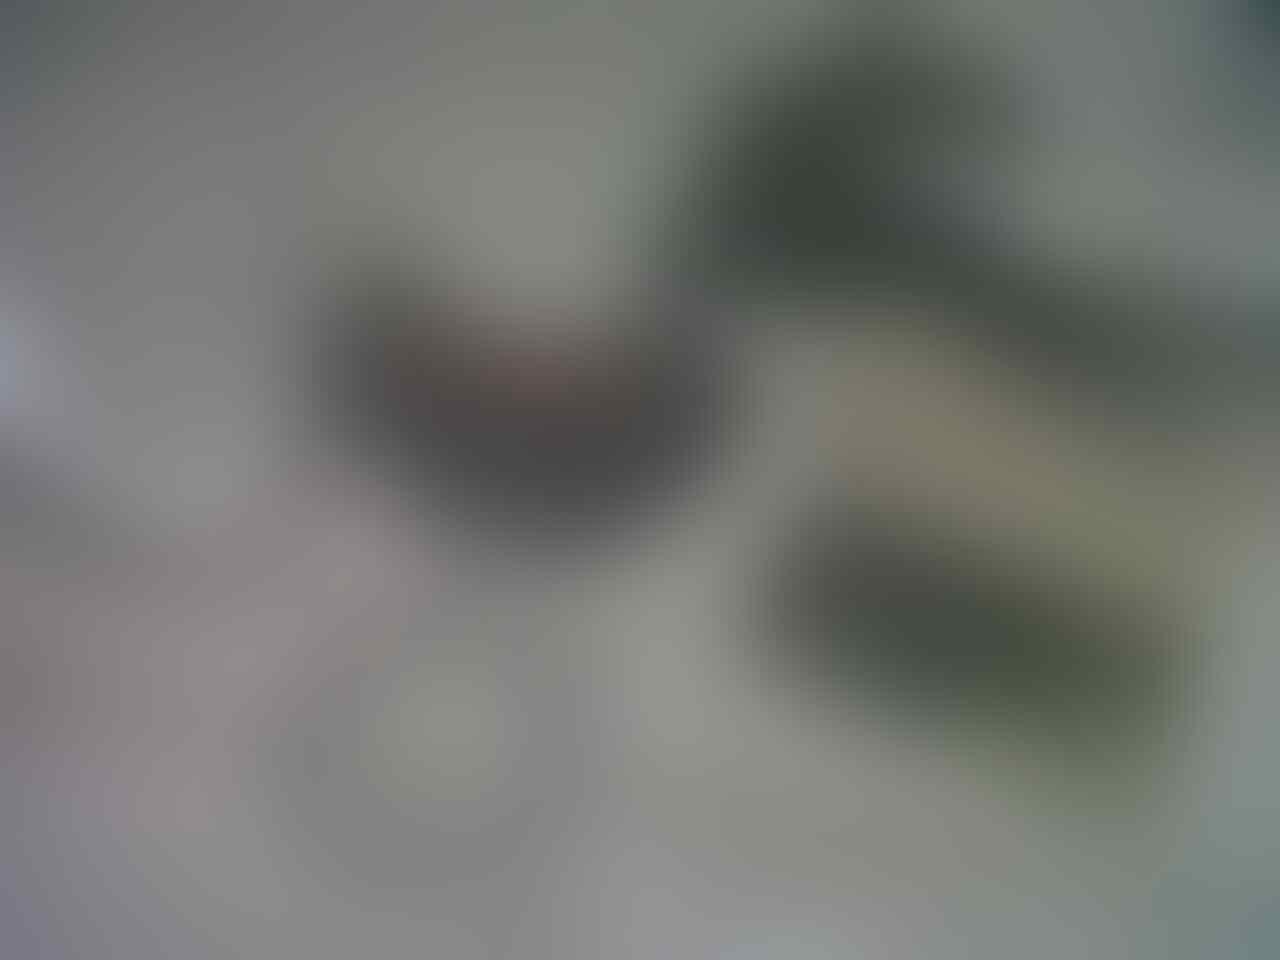 [HOT] Char POINT BLANK Letjend + Inventory Rame COD Jakarta